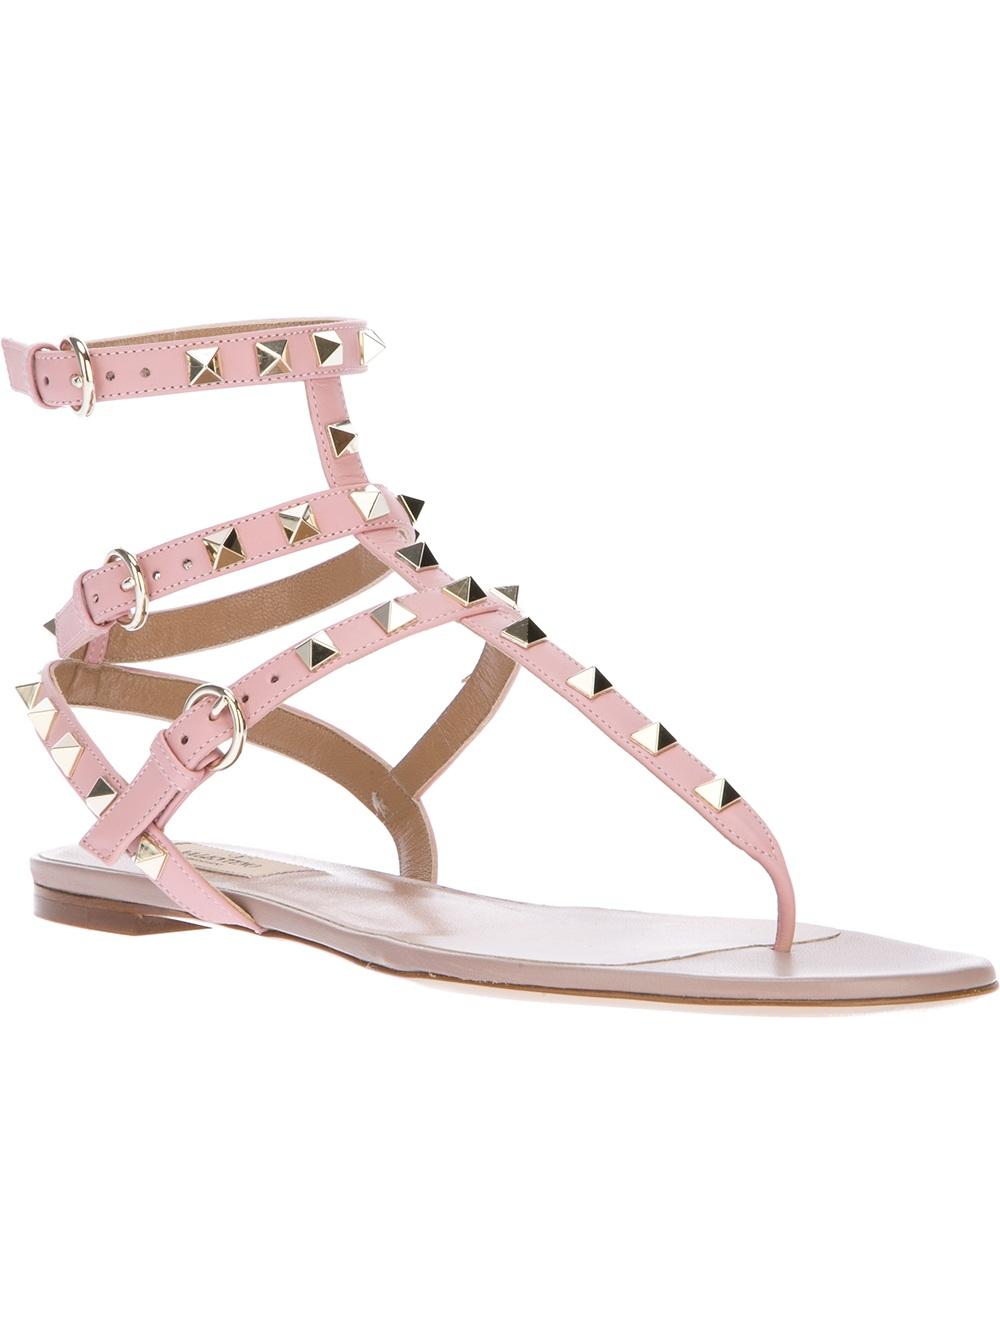 Farfetch Sale Valentino Shoes